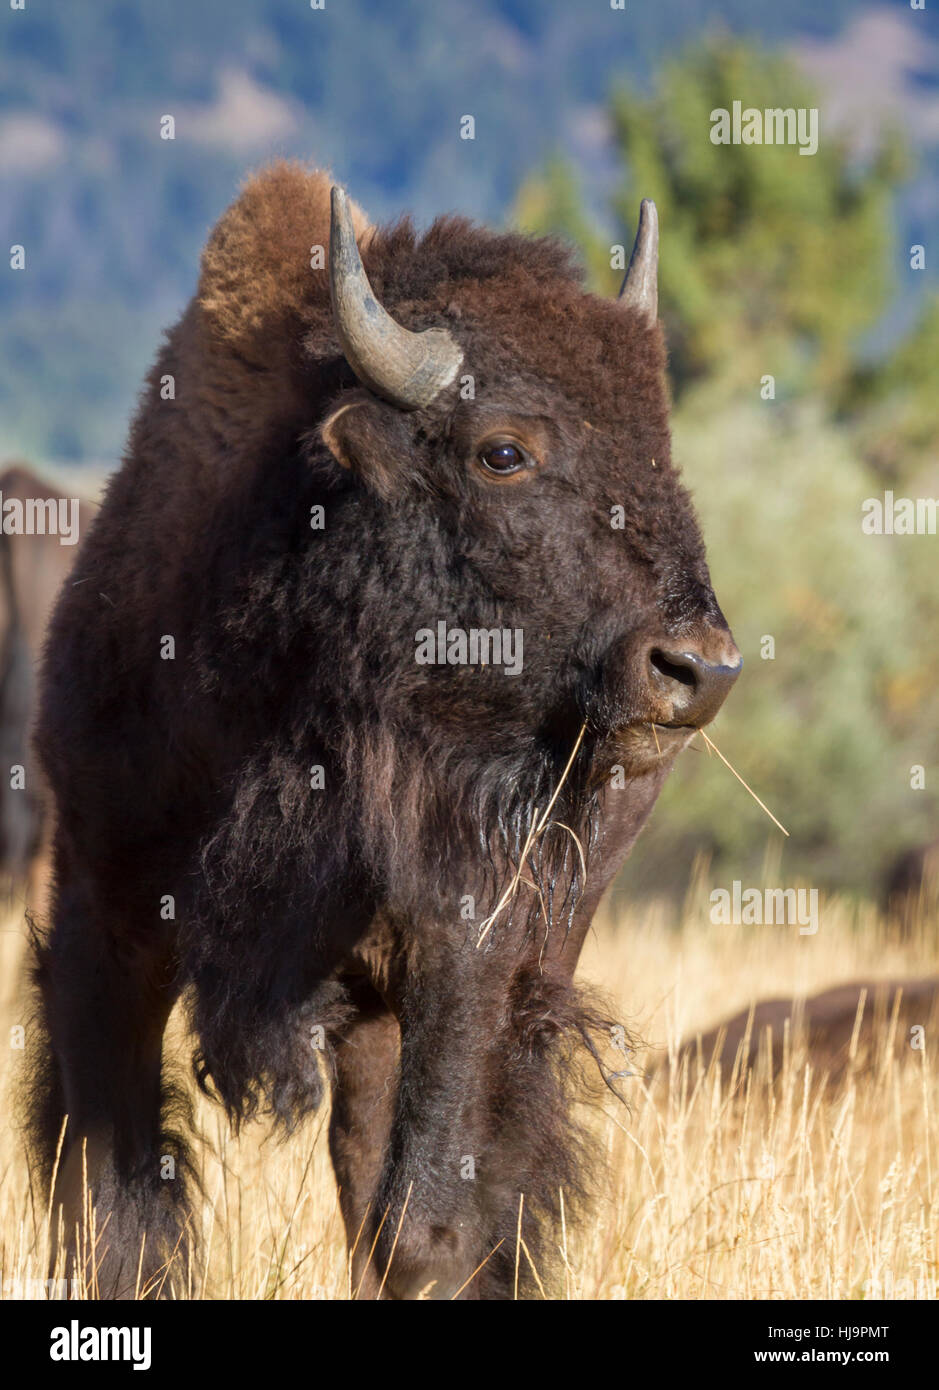 American bison (Bison bison) at Grand Teton national park Stock Photo